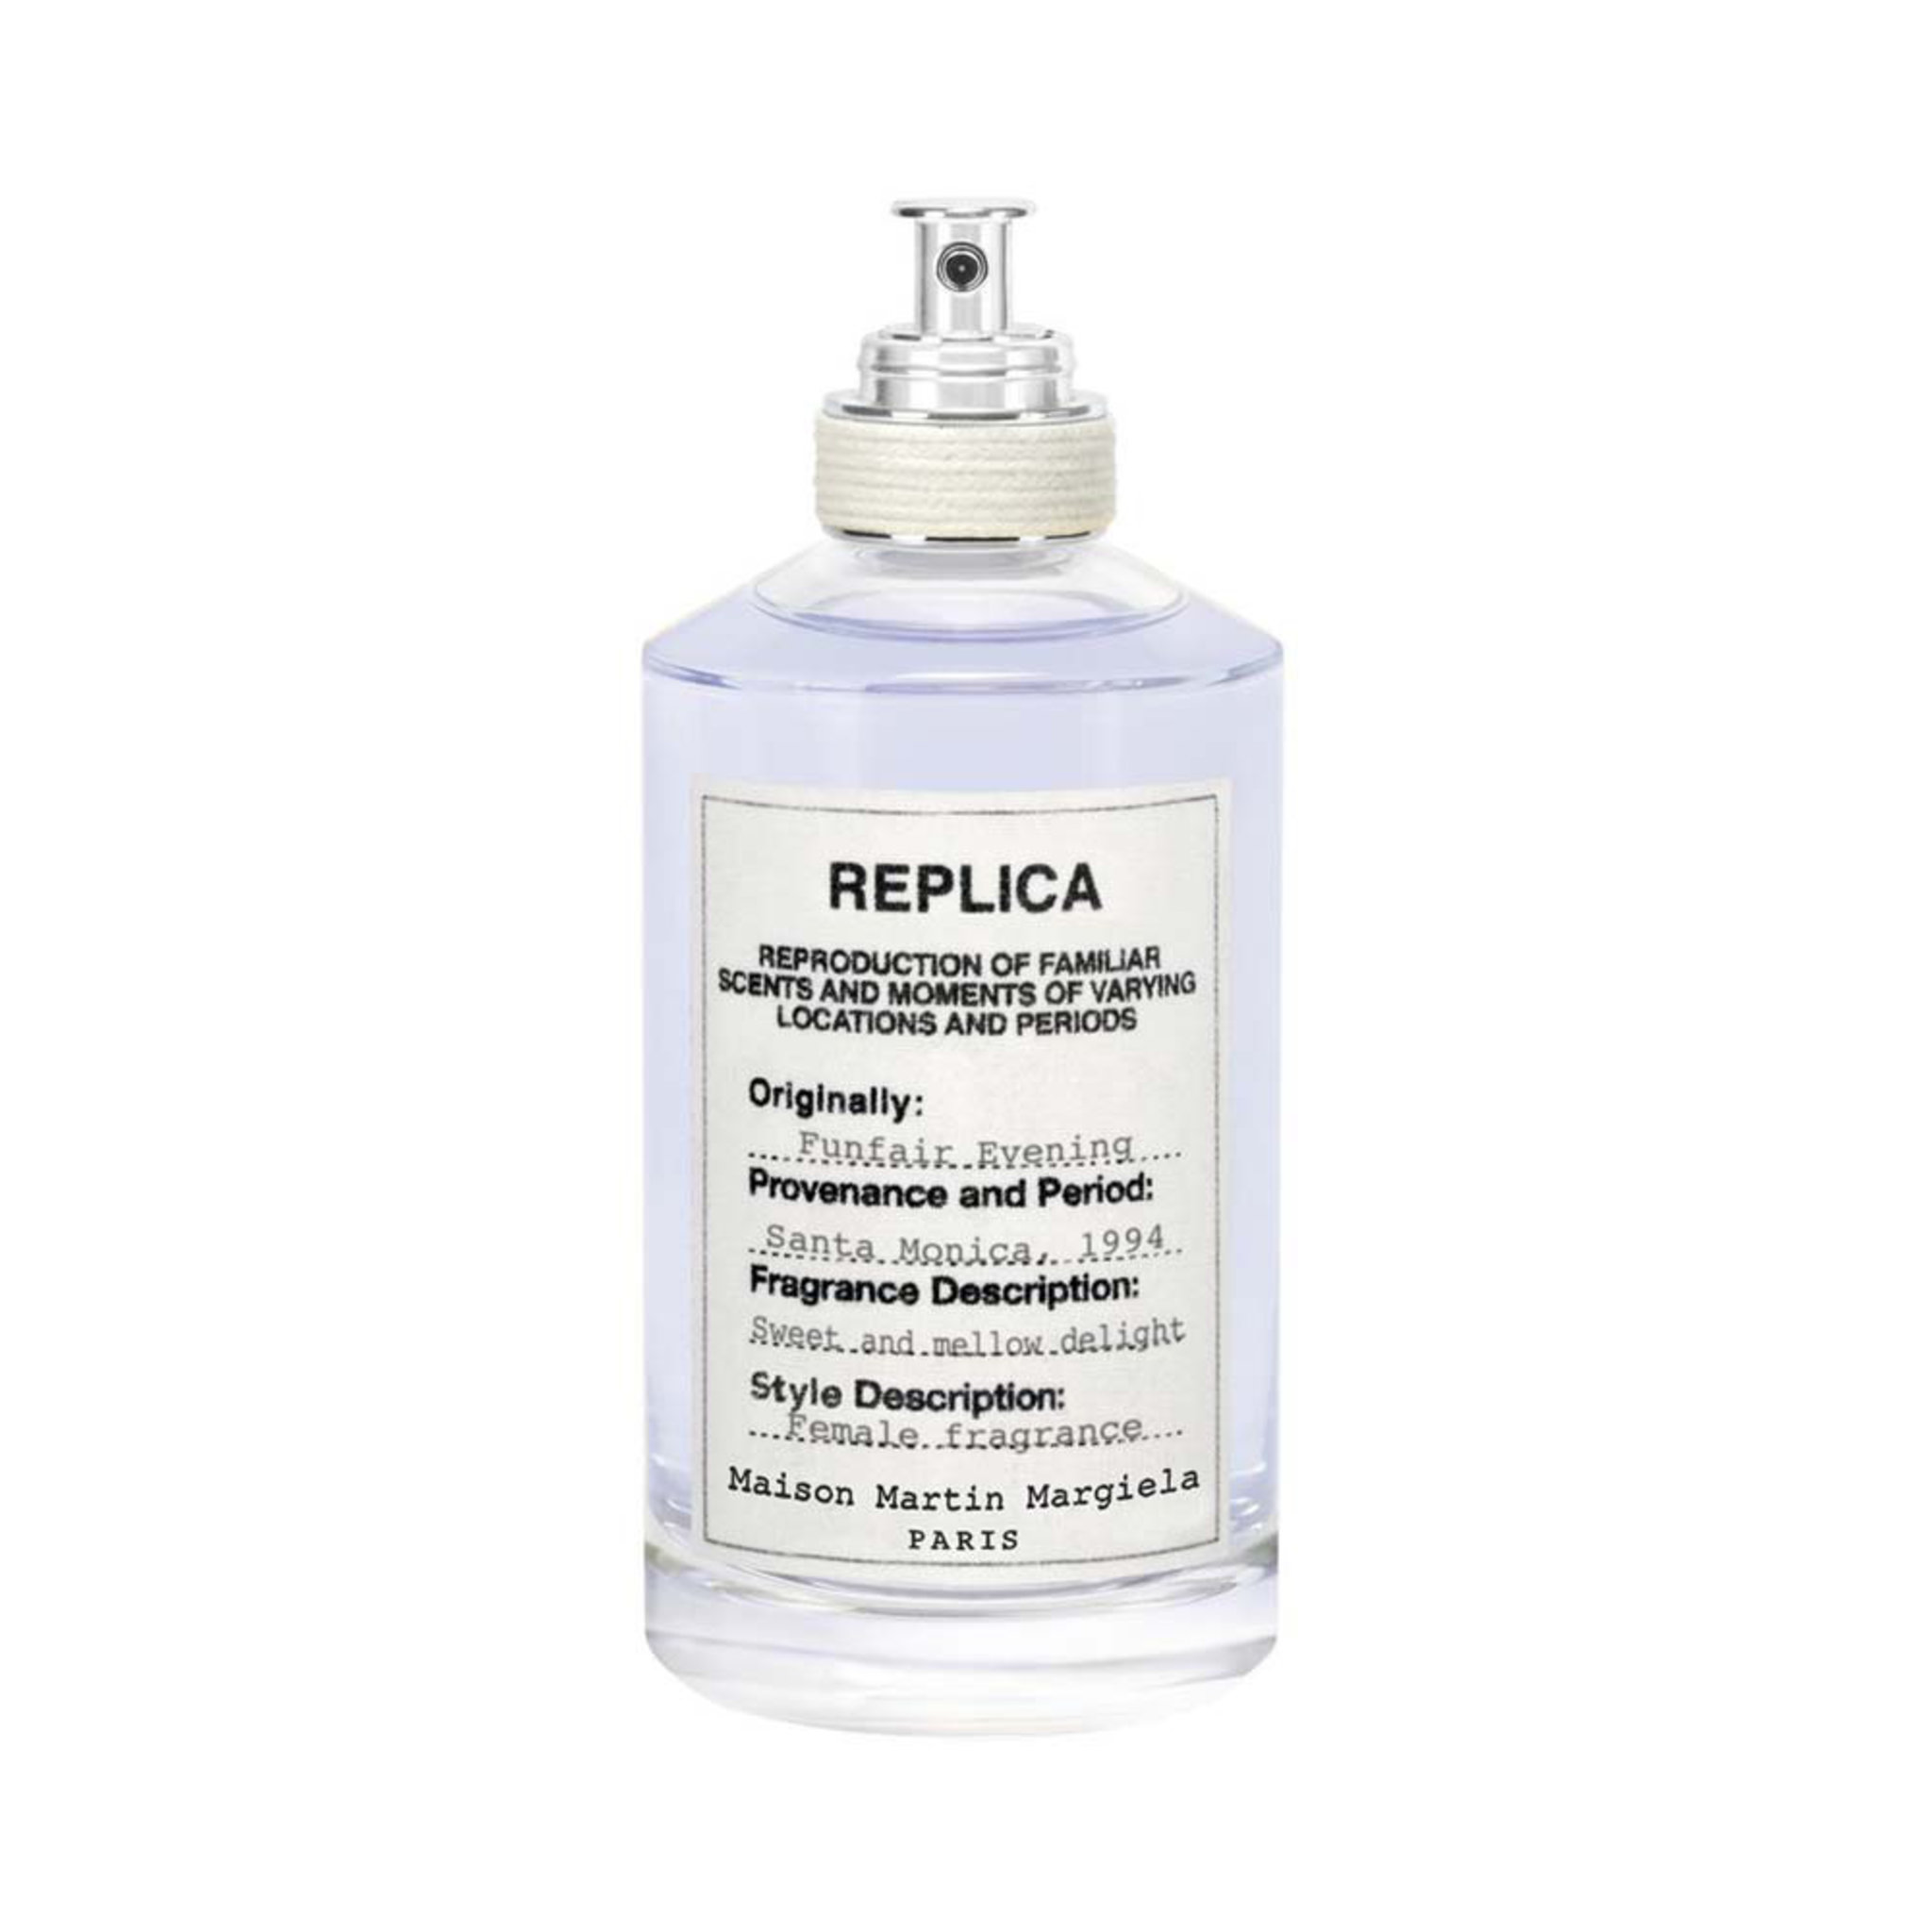 replica parfym herr